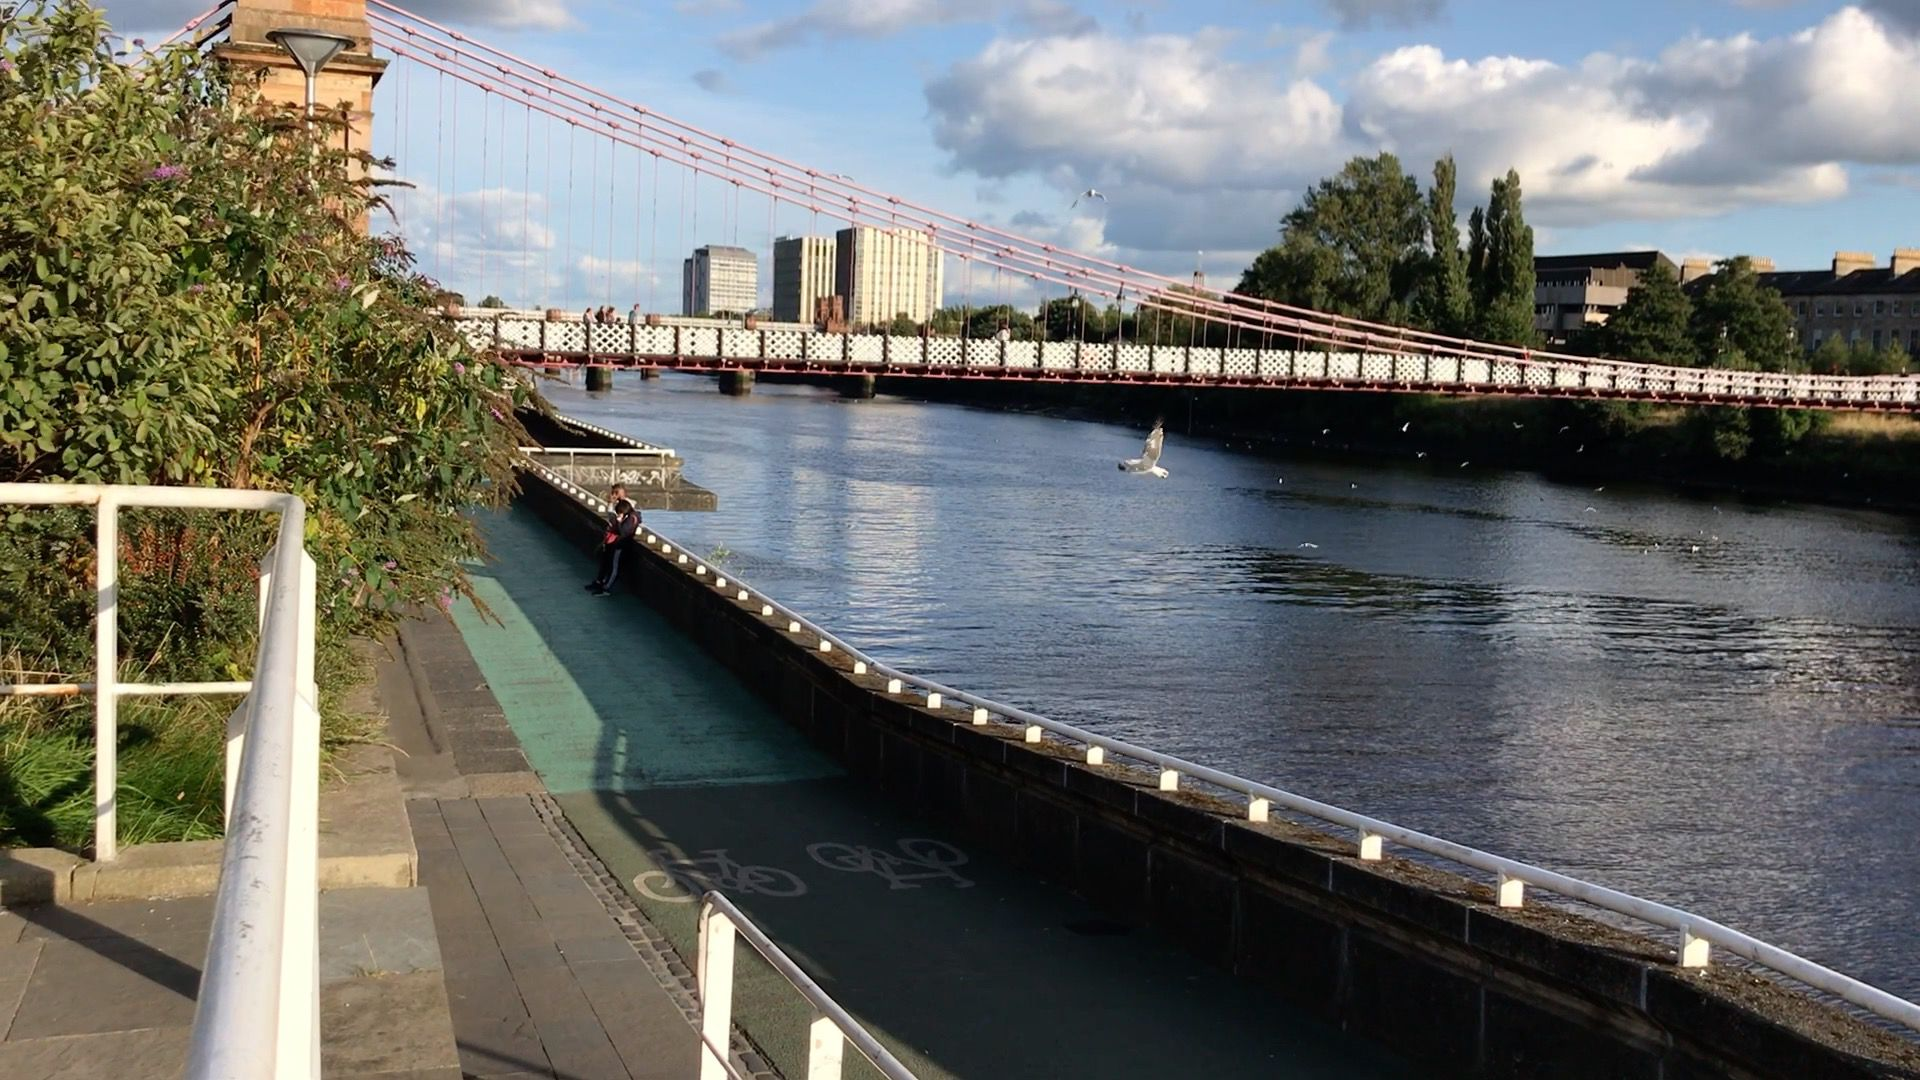 Glasgow - Clyde